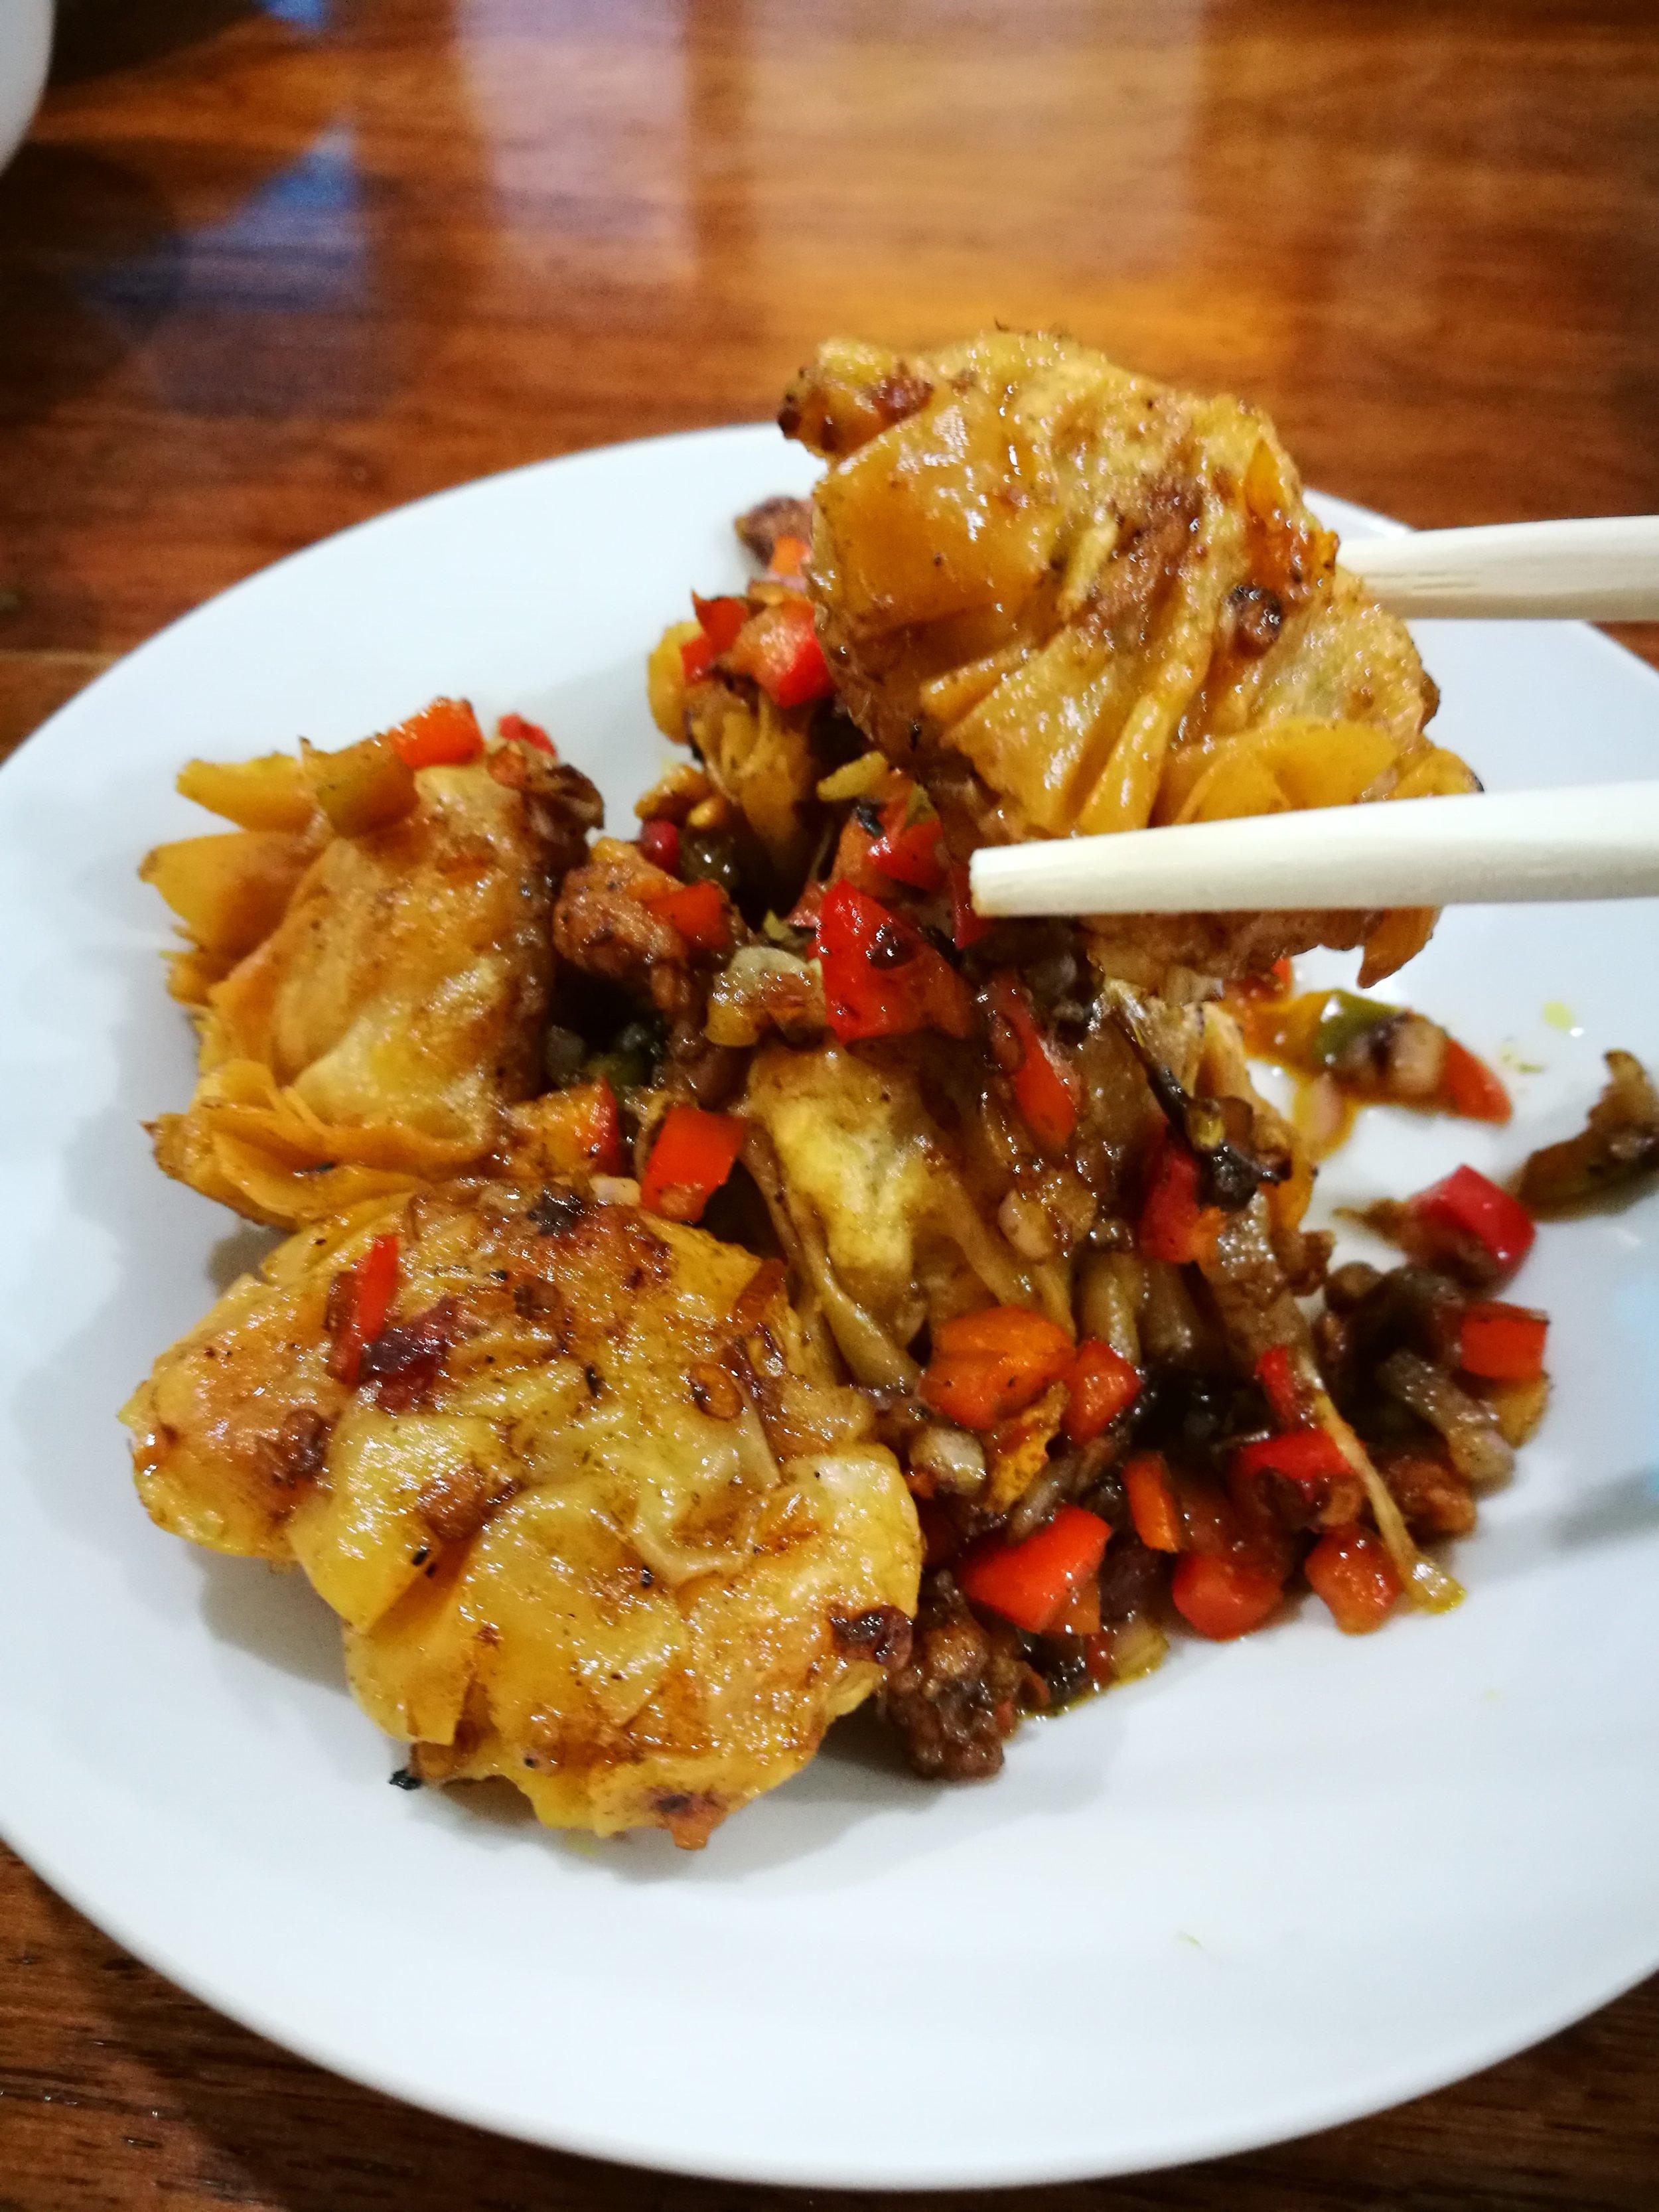 Spicy fried dumplings at Caitlyn's Dimsum